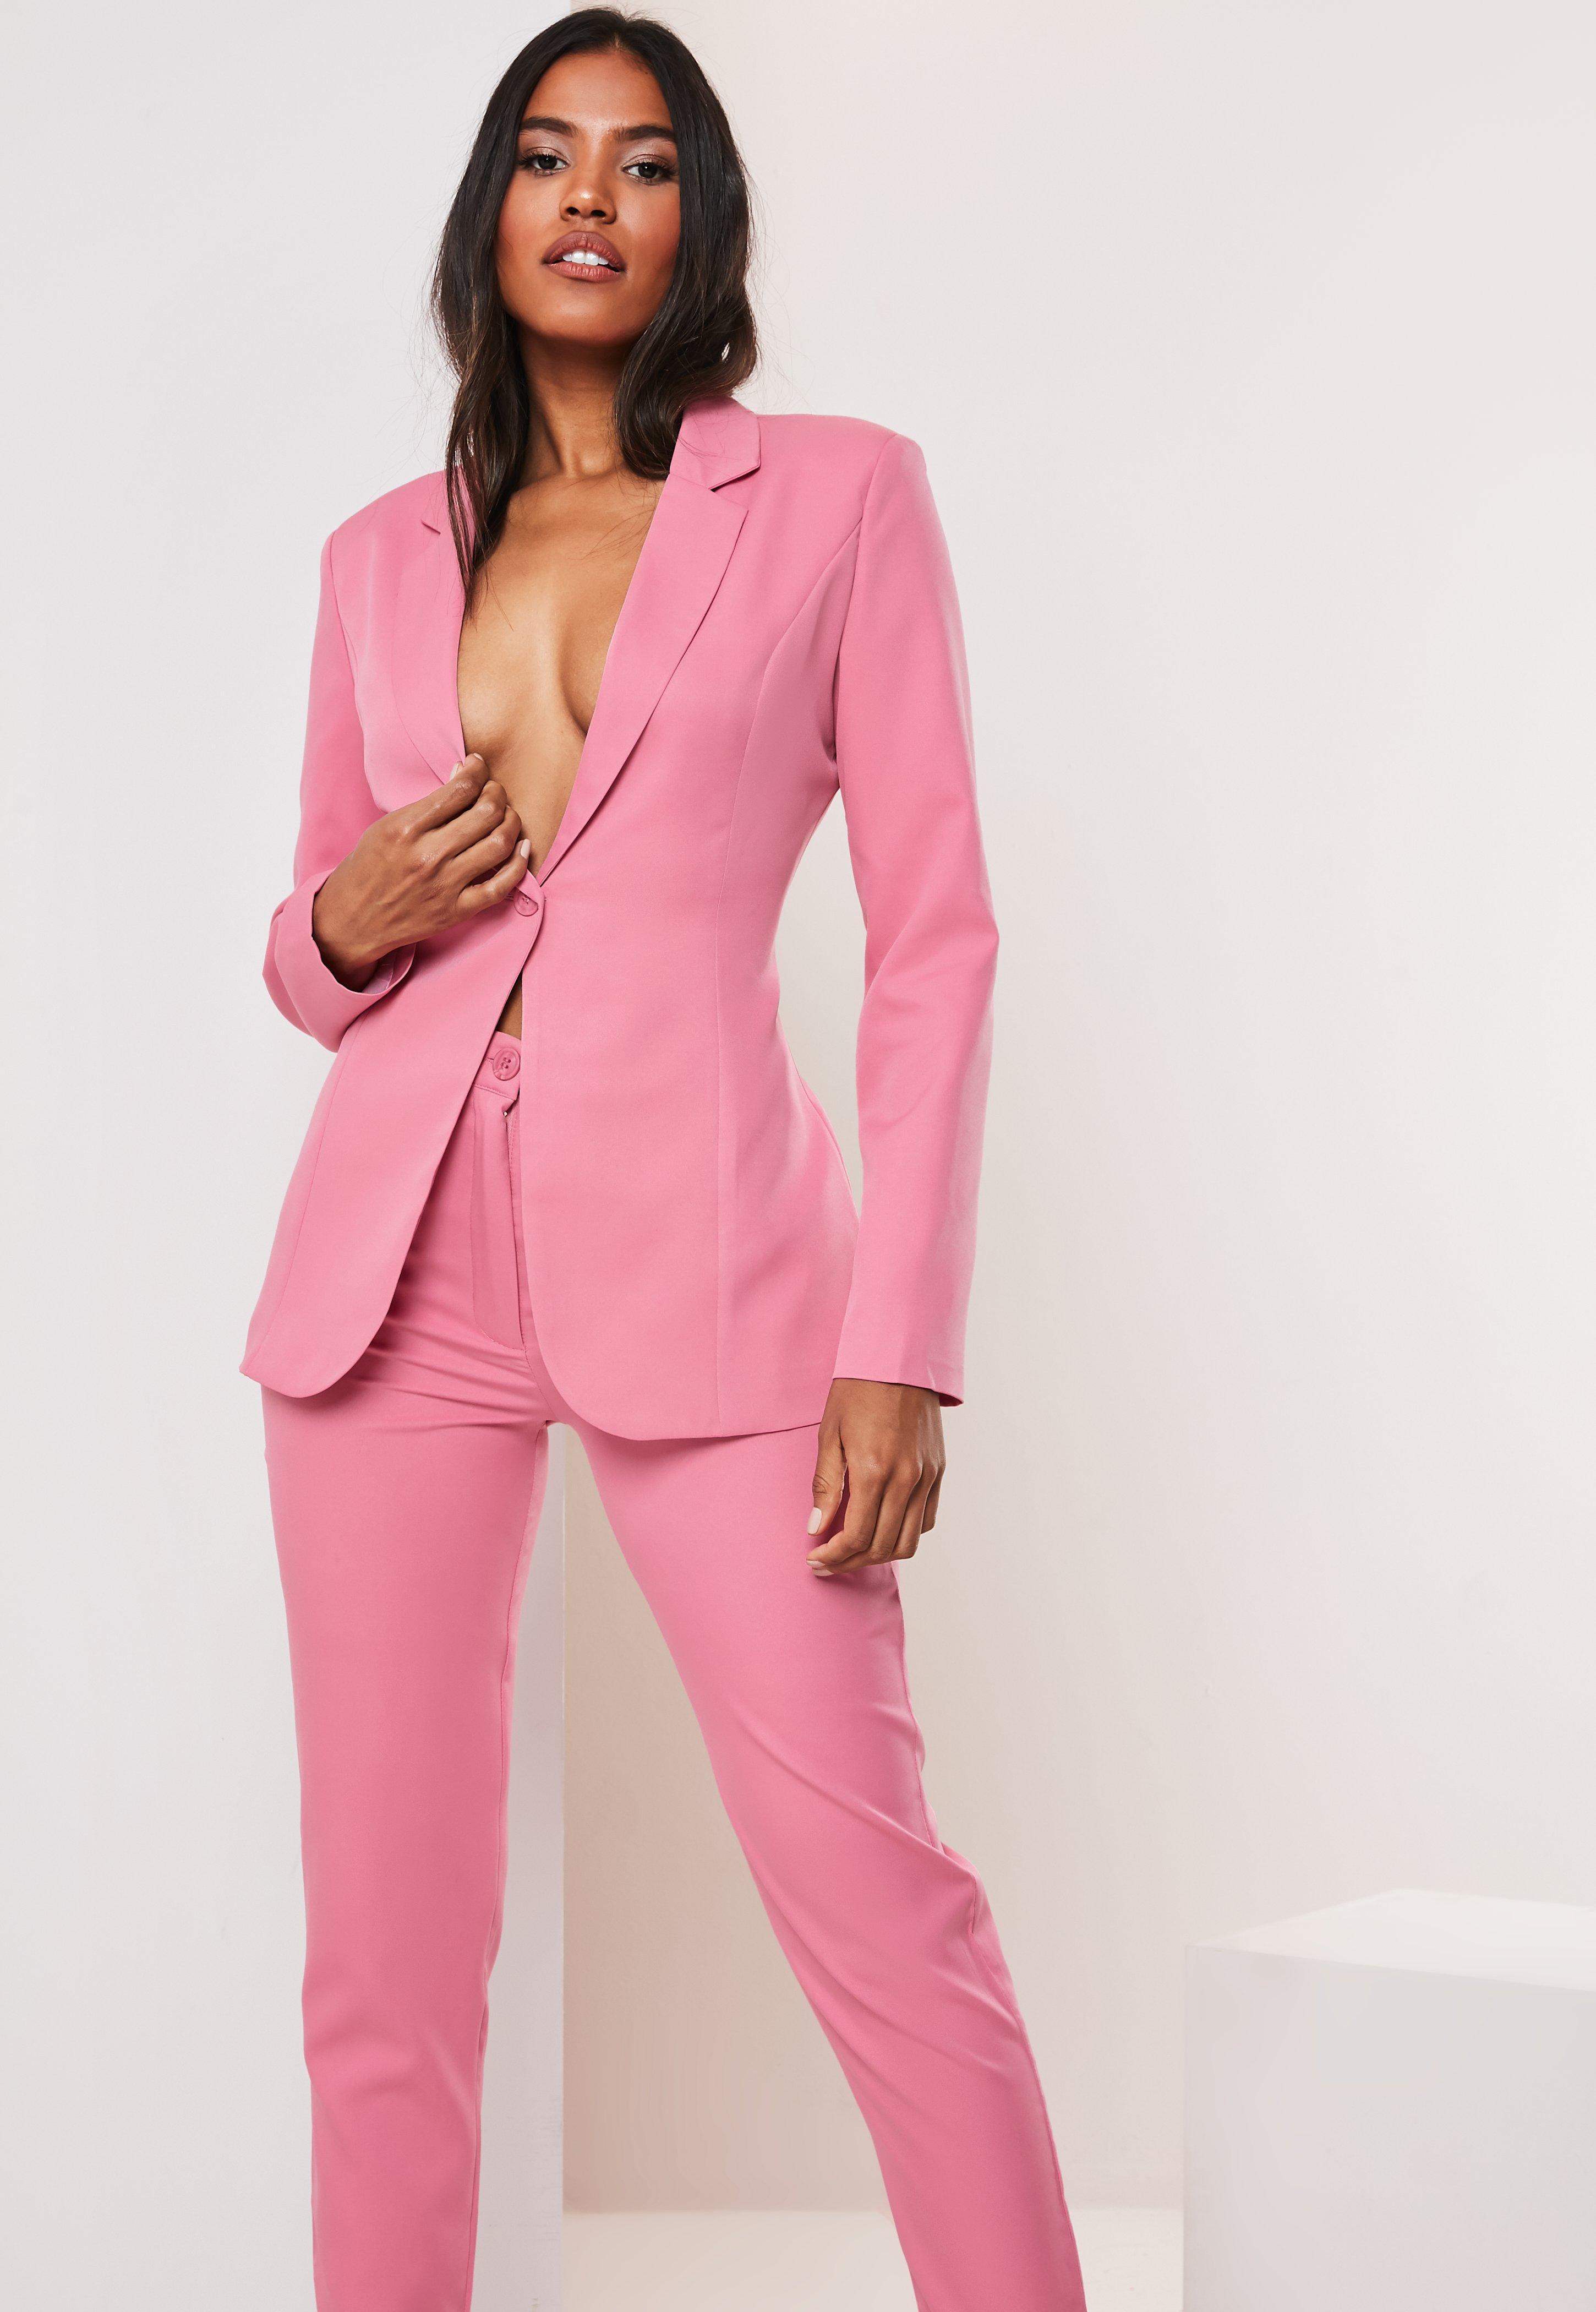 2e3e5279 Pink Co Ord Skinny Classic Blazer